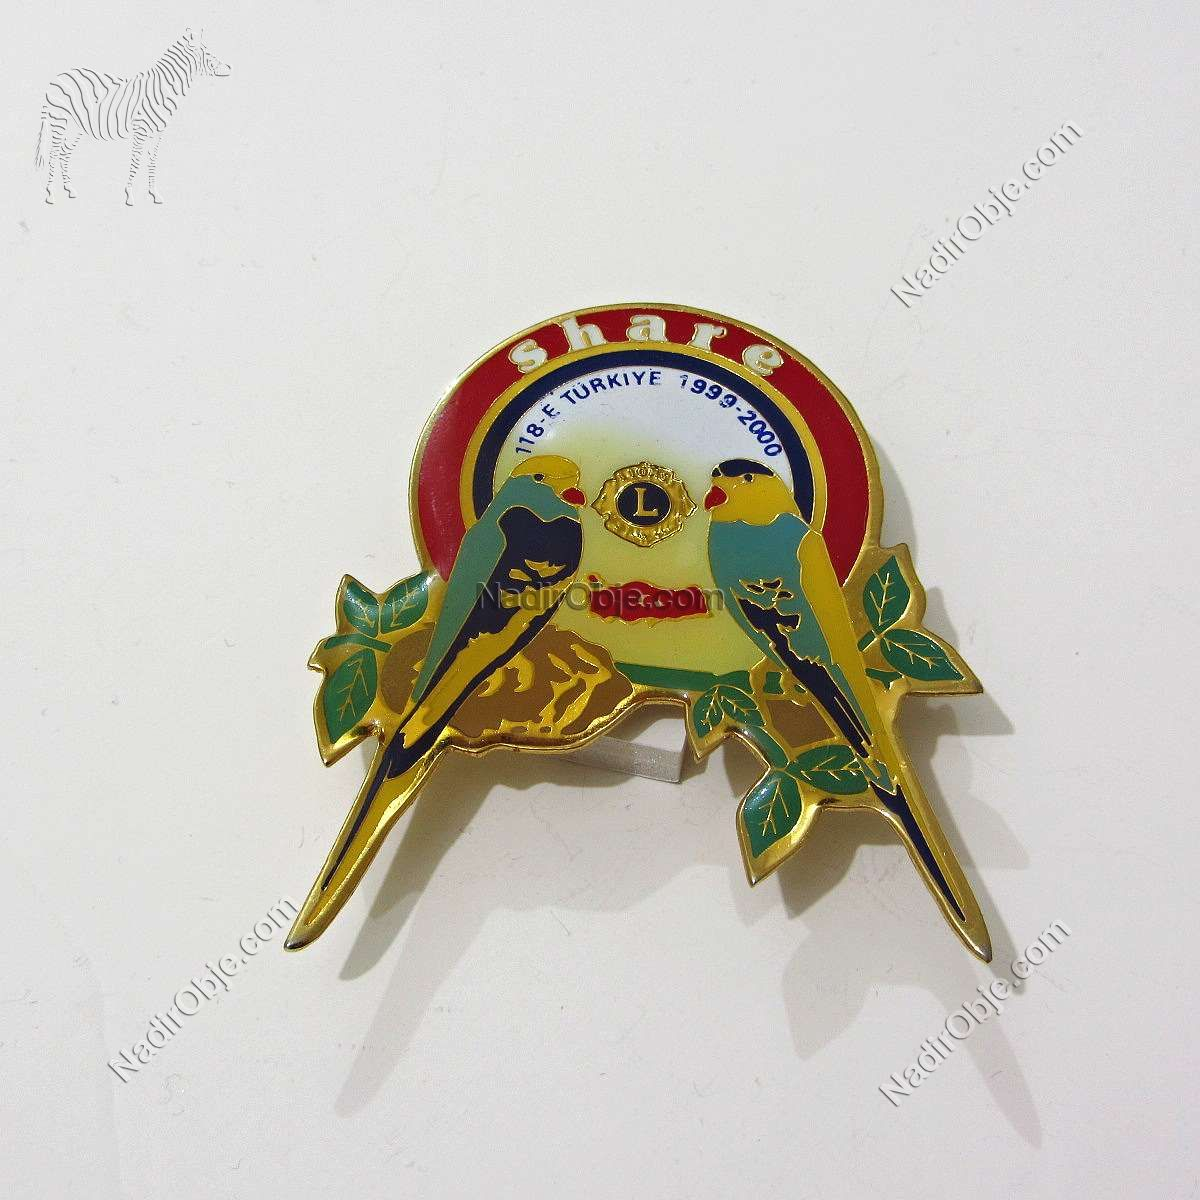 1999-2000 Lions Rozet – N2200 Metal Objeler Lapel Badge